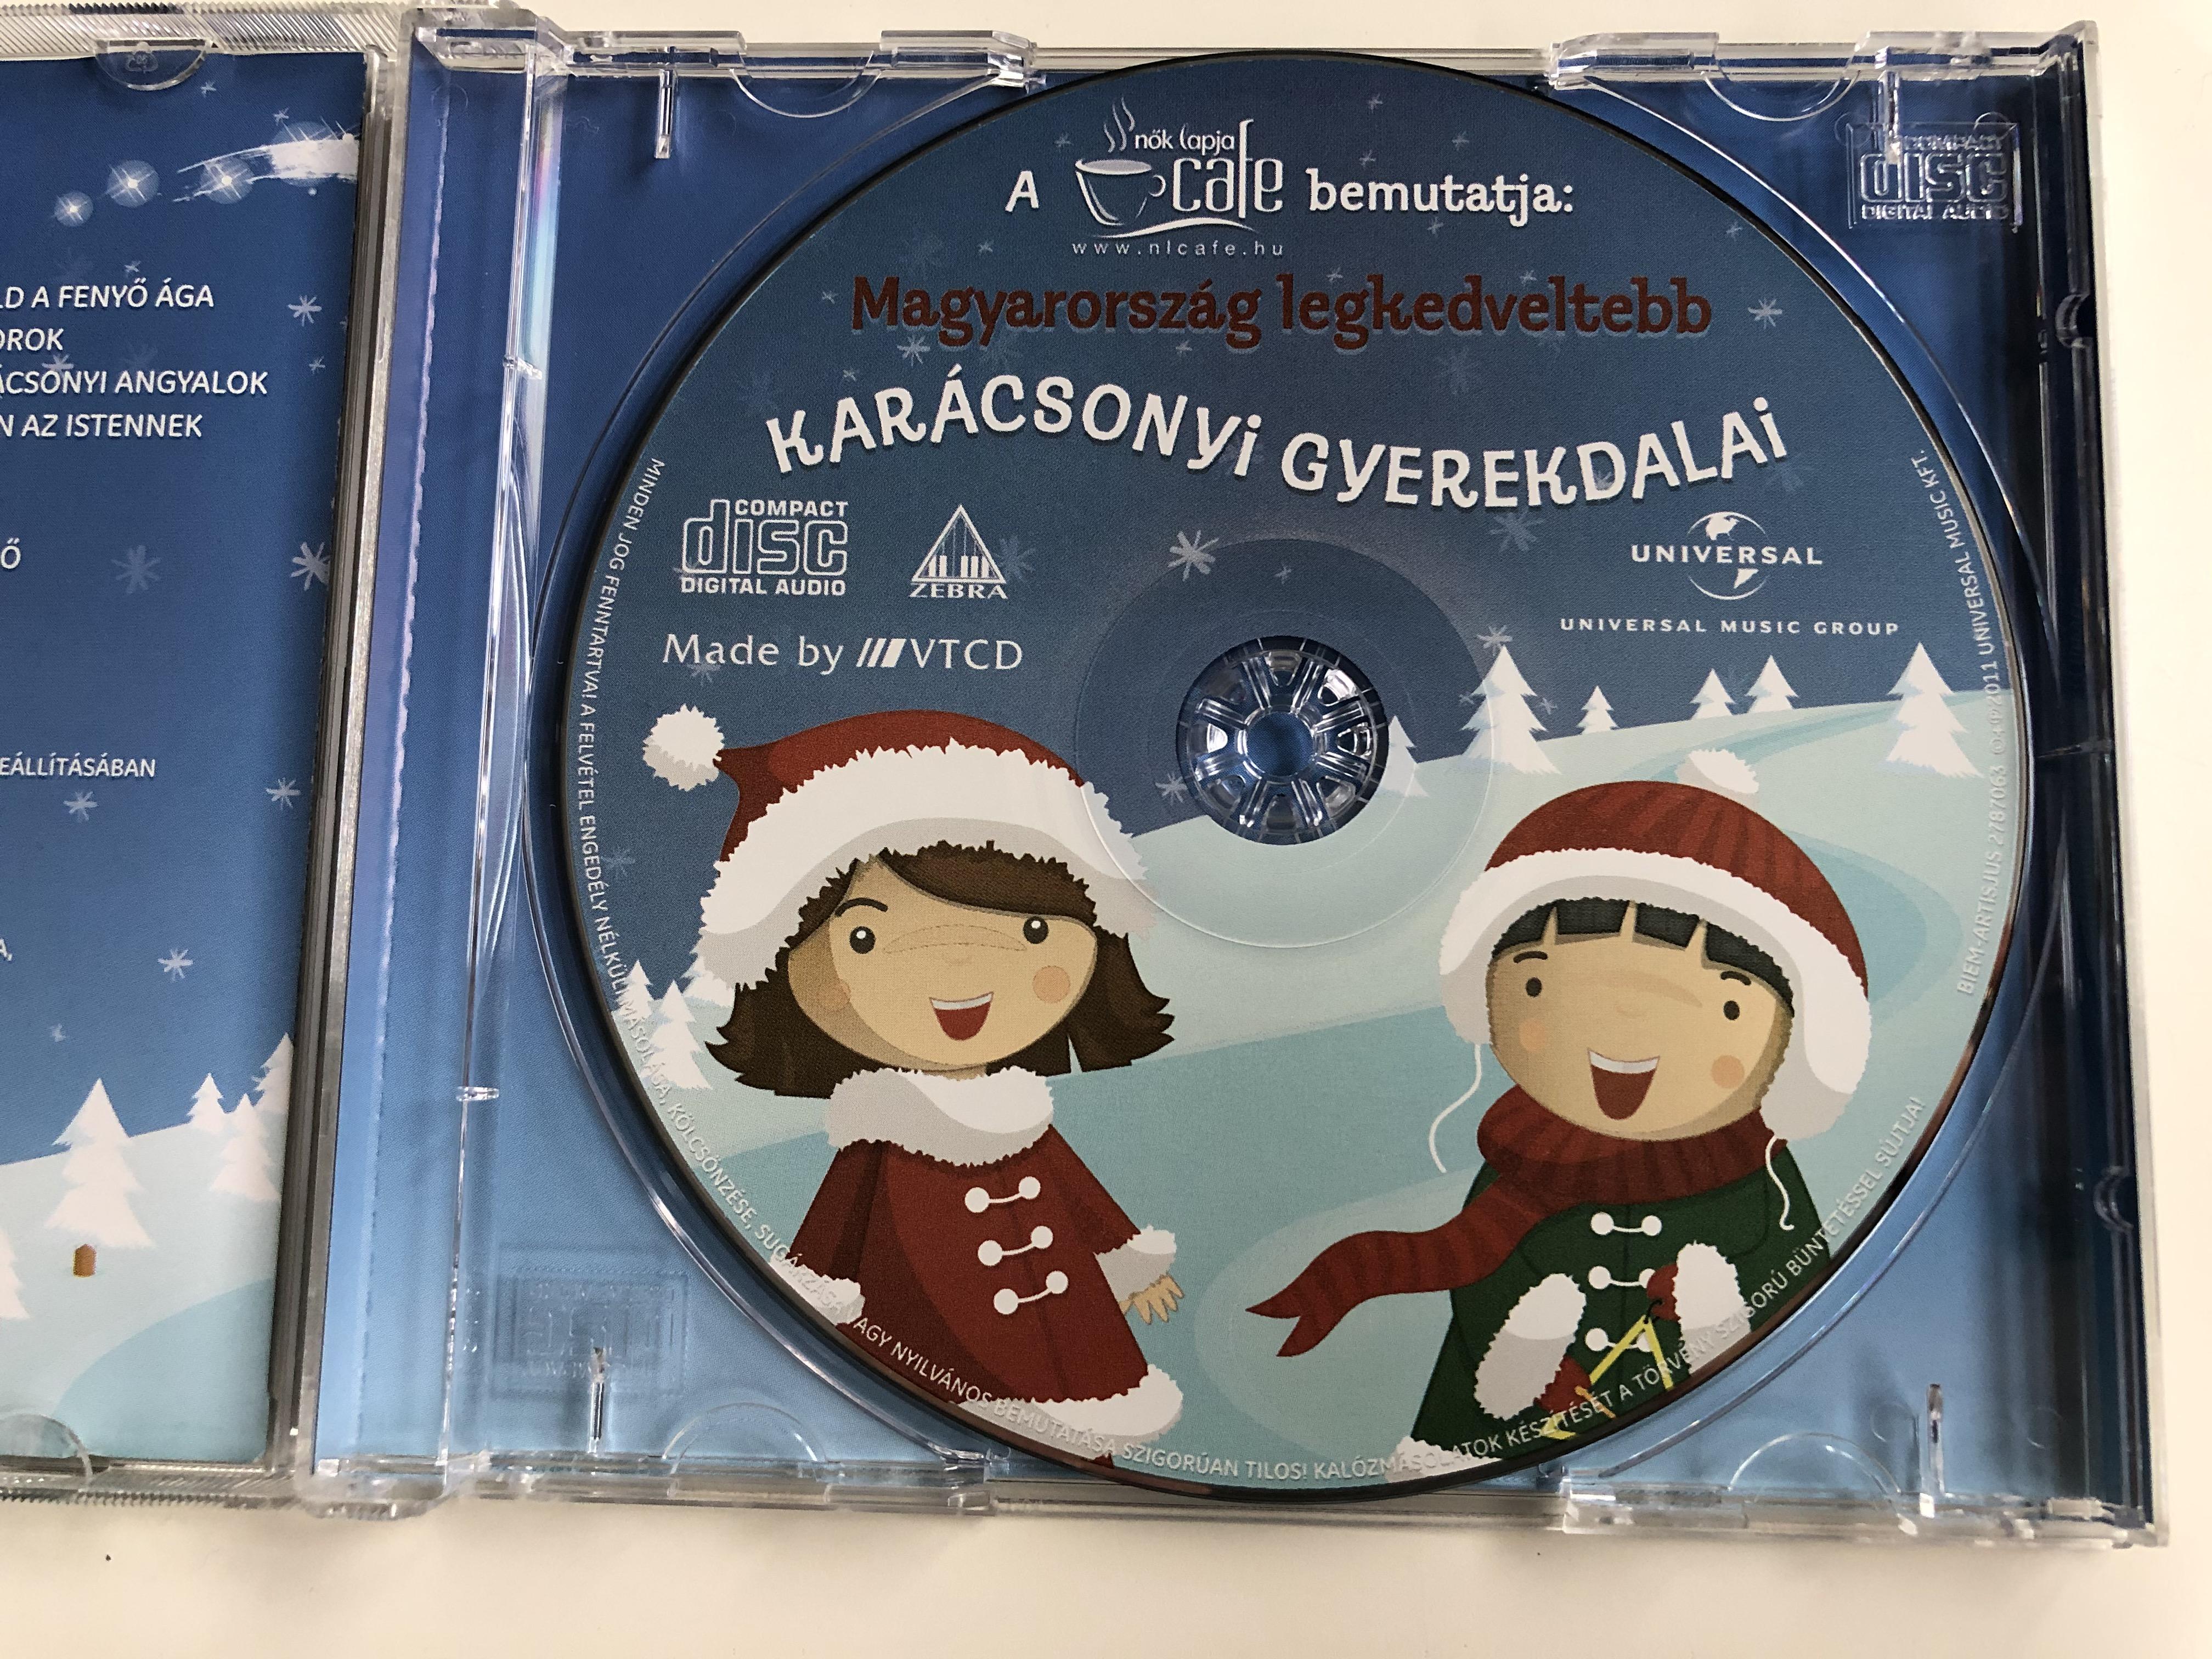 magyarorszag-legkedveltebb-karacsonyi-gyerekdalai-univerzal-music-audio-cd-2011-2787063-3-.jpg